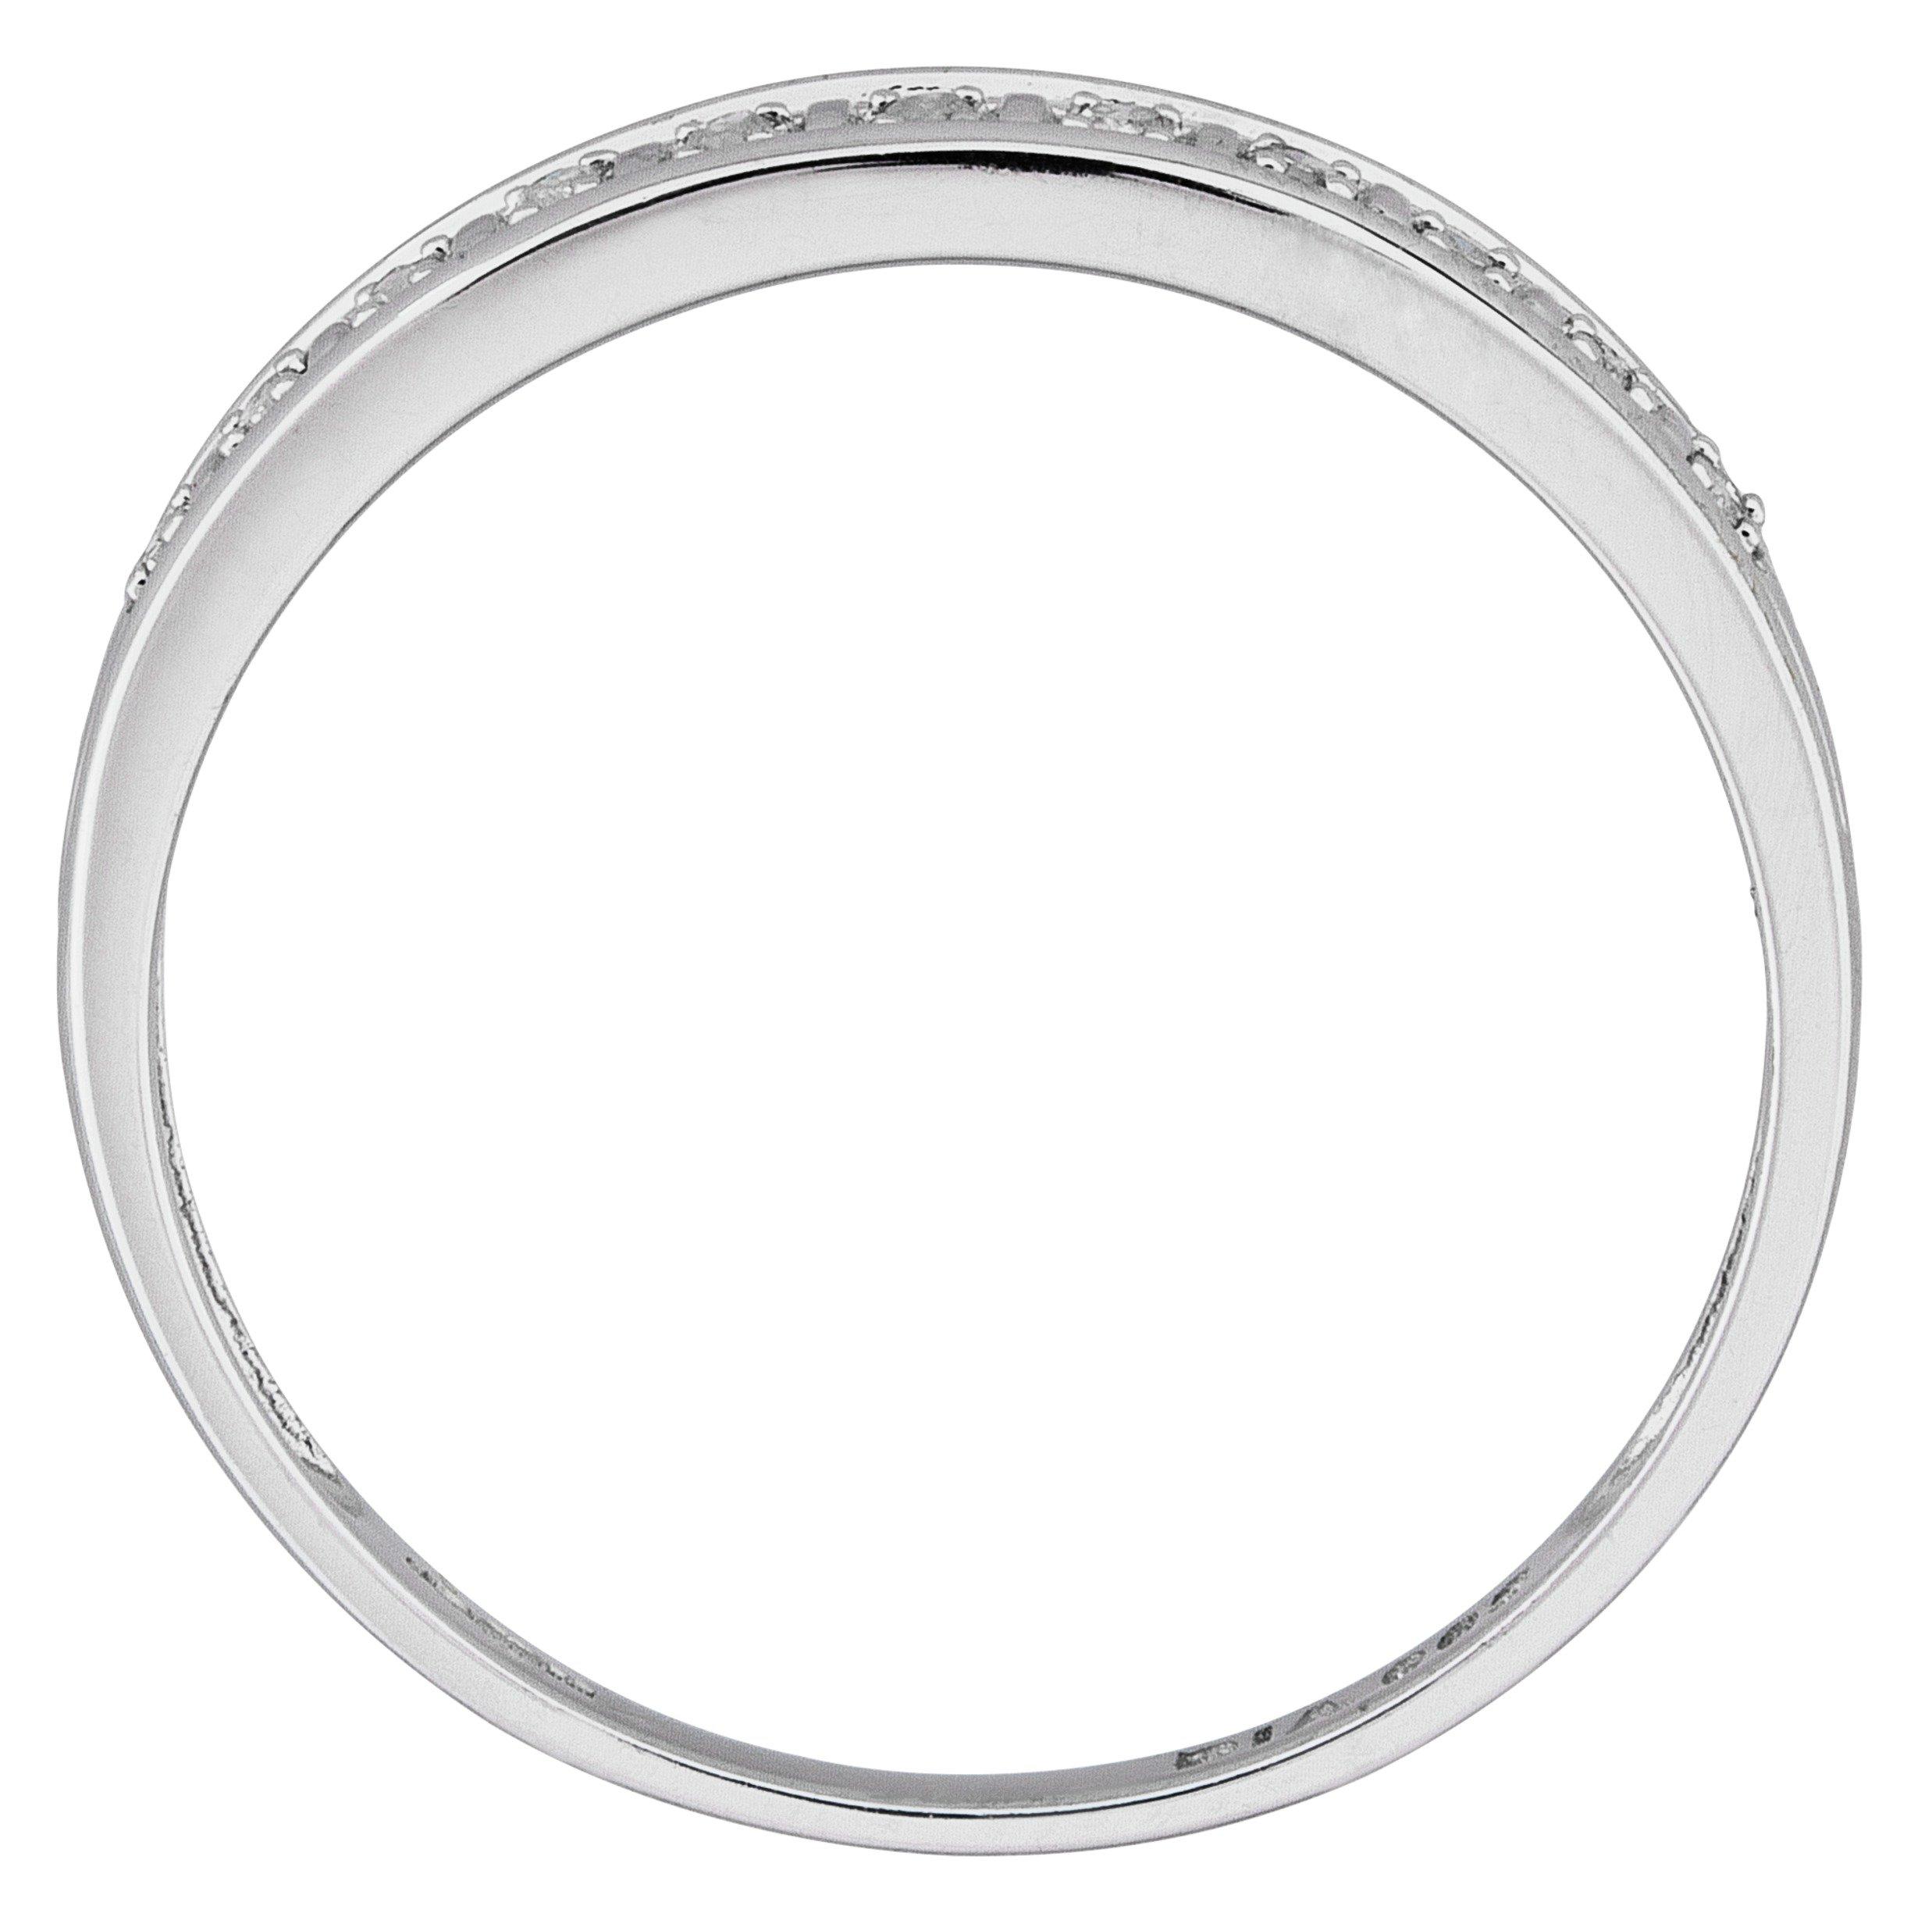 Buy Revere 9ct White Gold Diamond Accent Eternity Ring at Argos